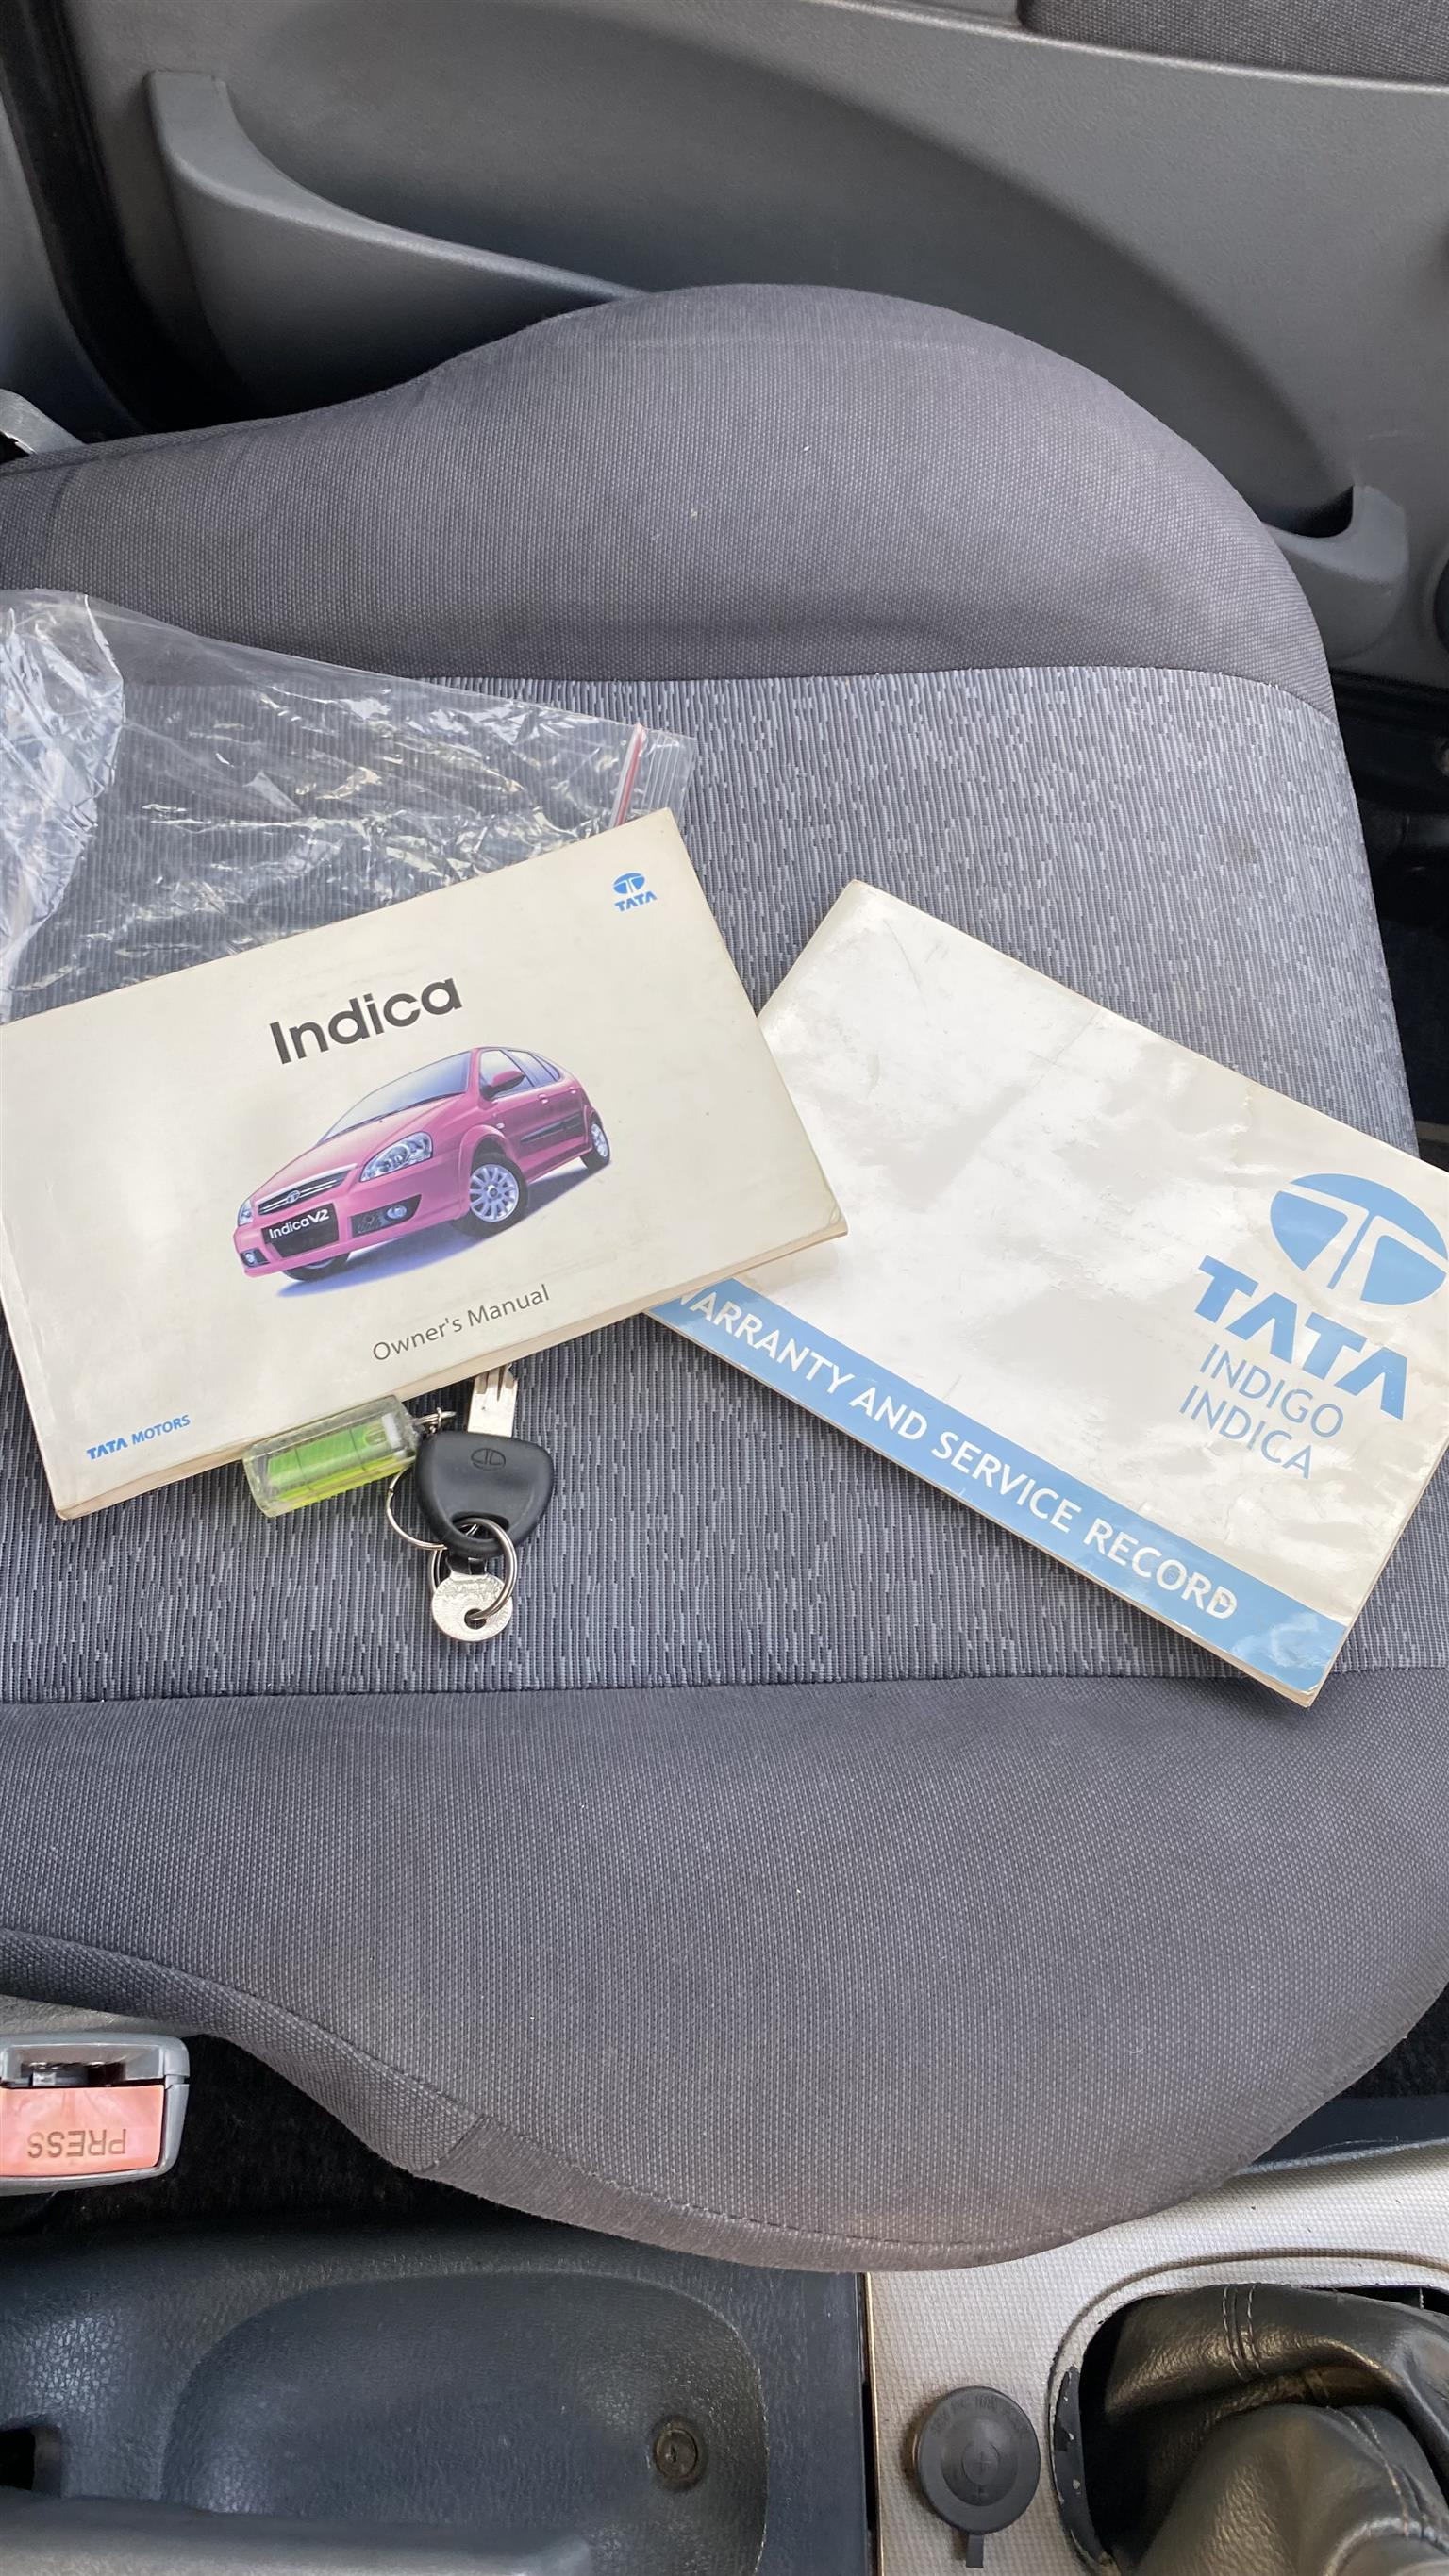 2007 Tata indica for sale